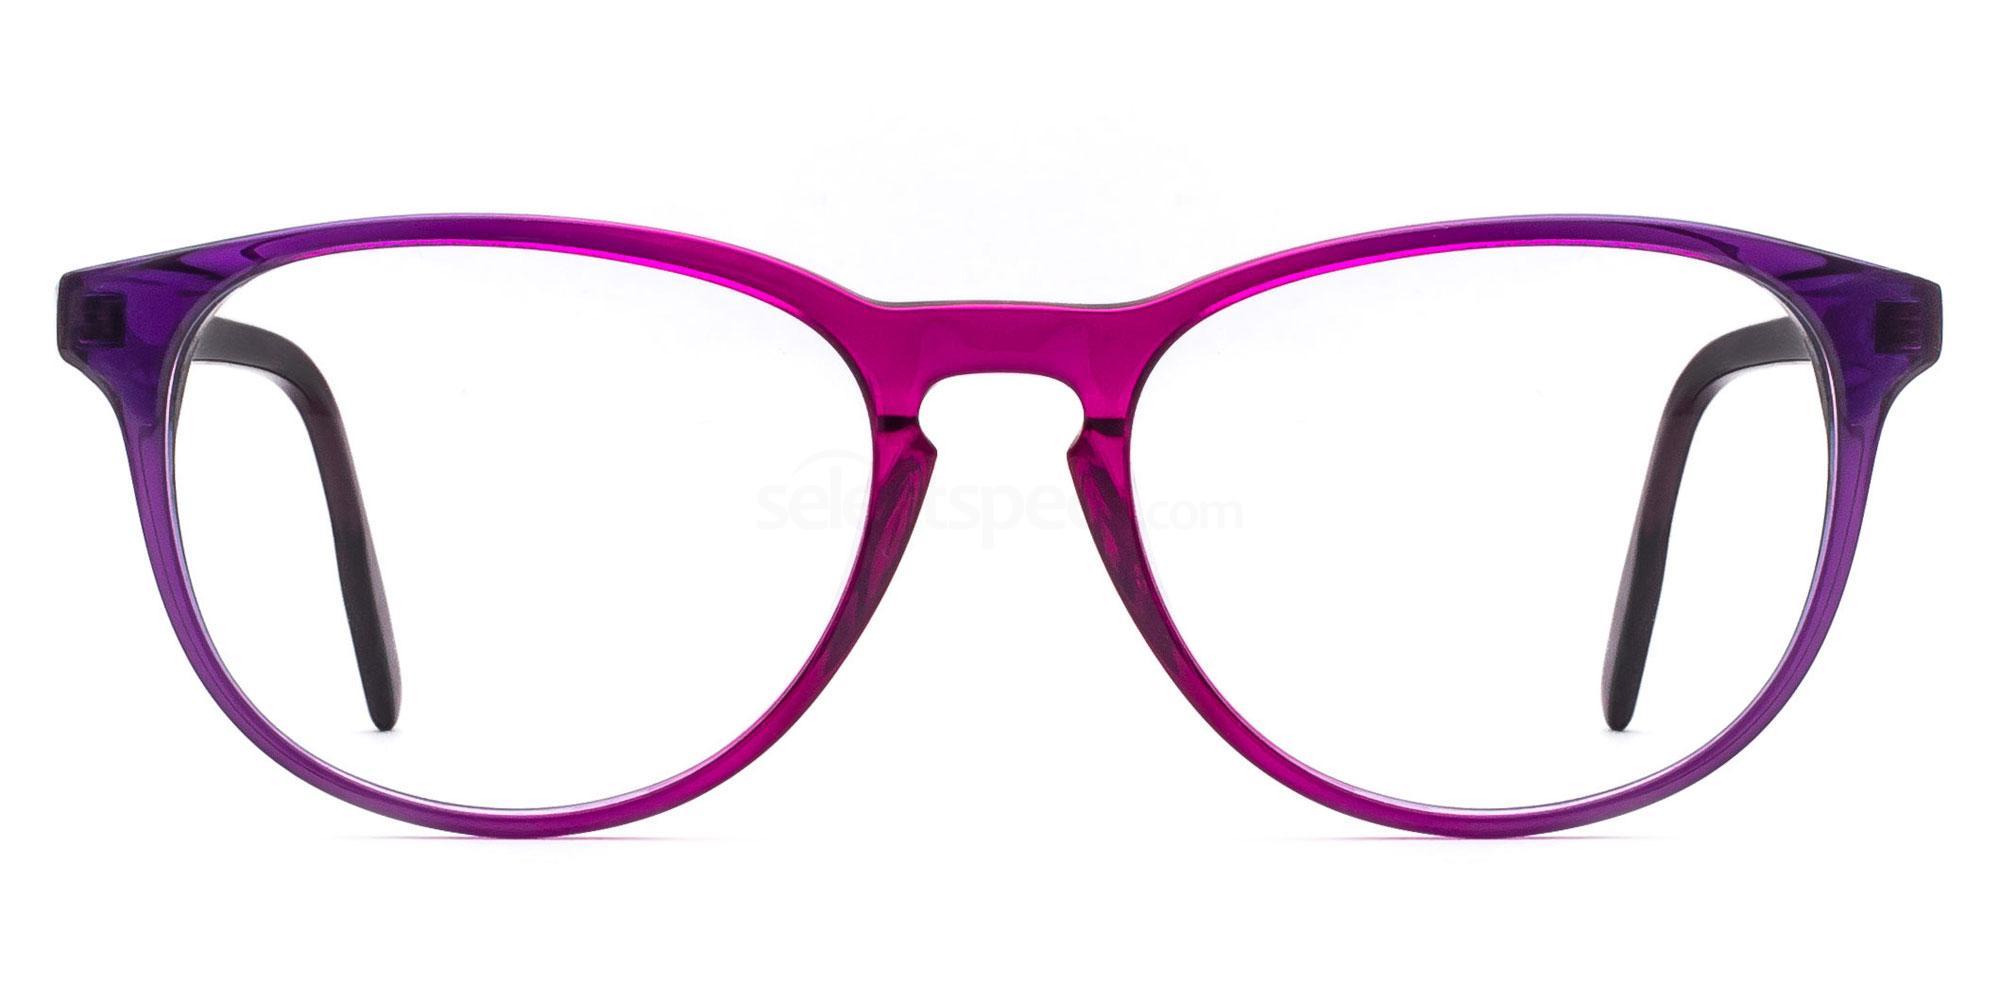 C1 SRA114 Glasses, Infinity